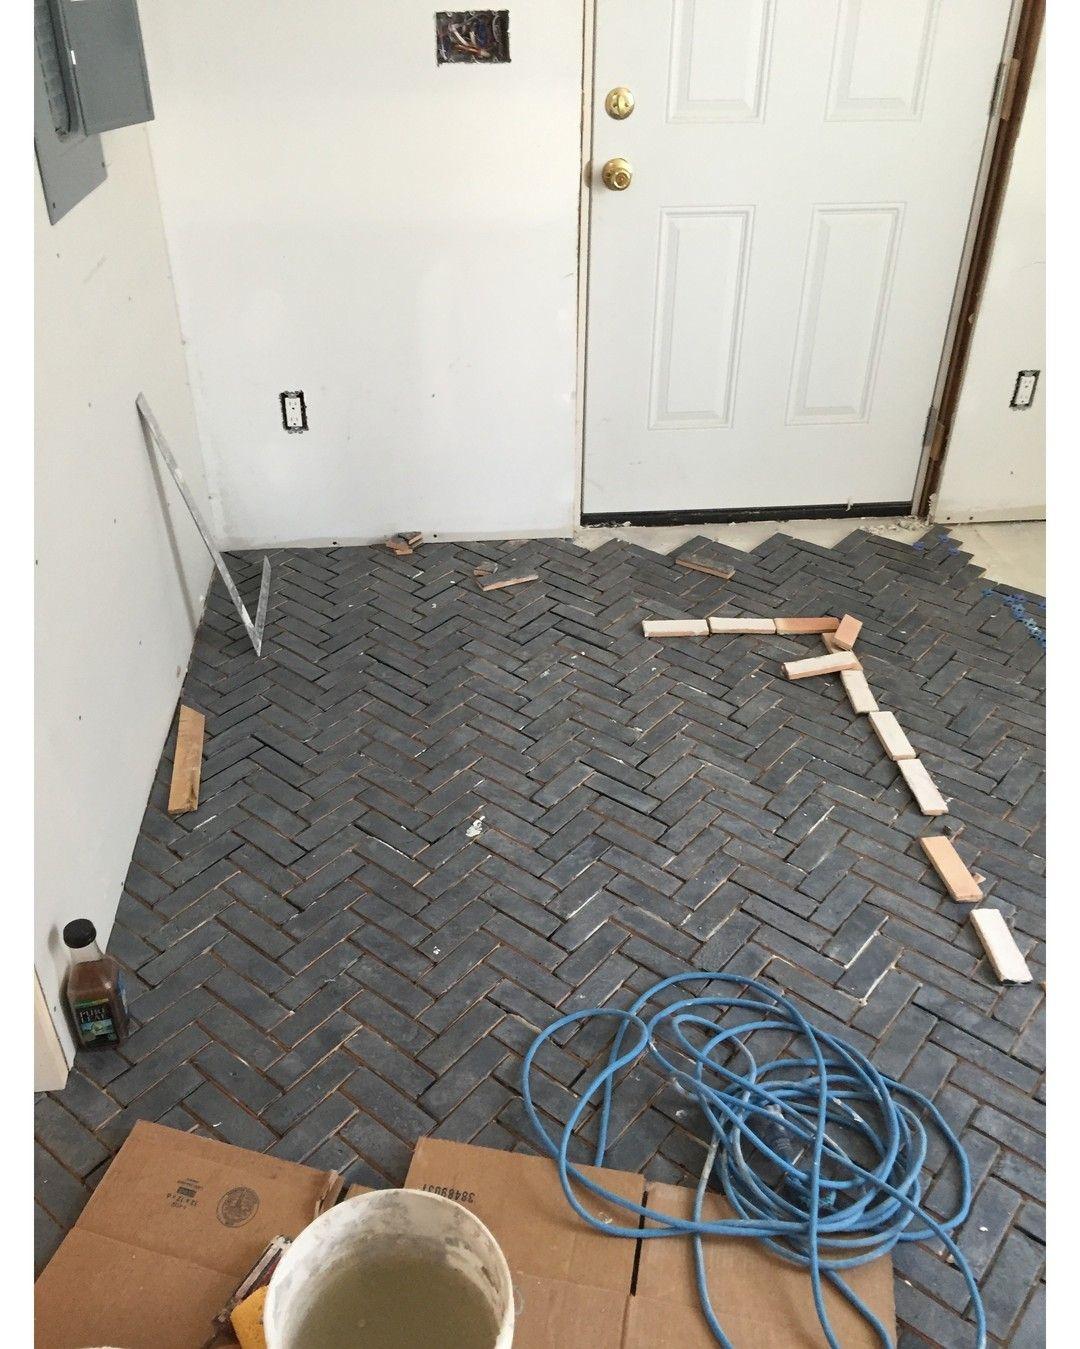 #tile #instabathroom #tiles #tiled #tiling #tilework #interior #interiors #interiordesign #interiordesigner #interiorinspiration #interiorinspiration #tiler #featurewall #walltiles #tilelove #instahome #bathroomdesign #tileaddiction #pattern #bathroomremodel #hardwoodtile #finehomebuilding by falcon_industries